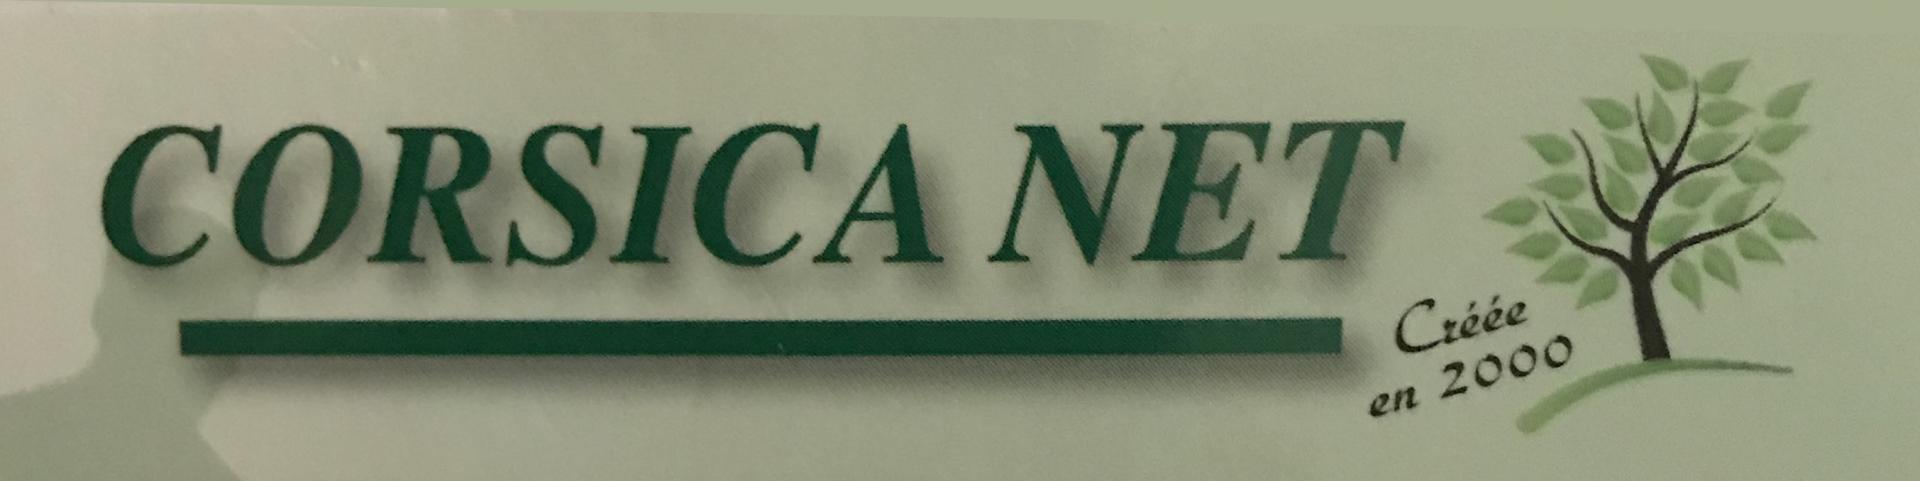 Corsica logo.png